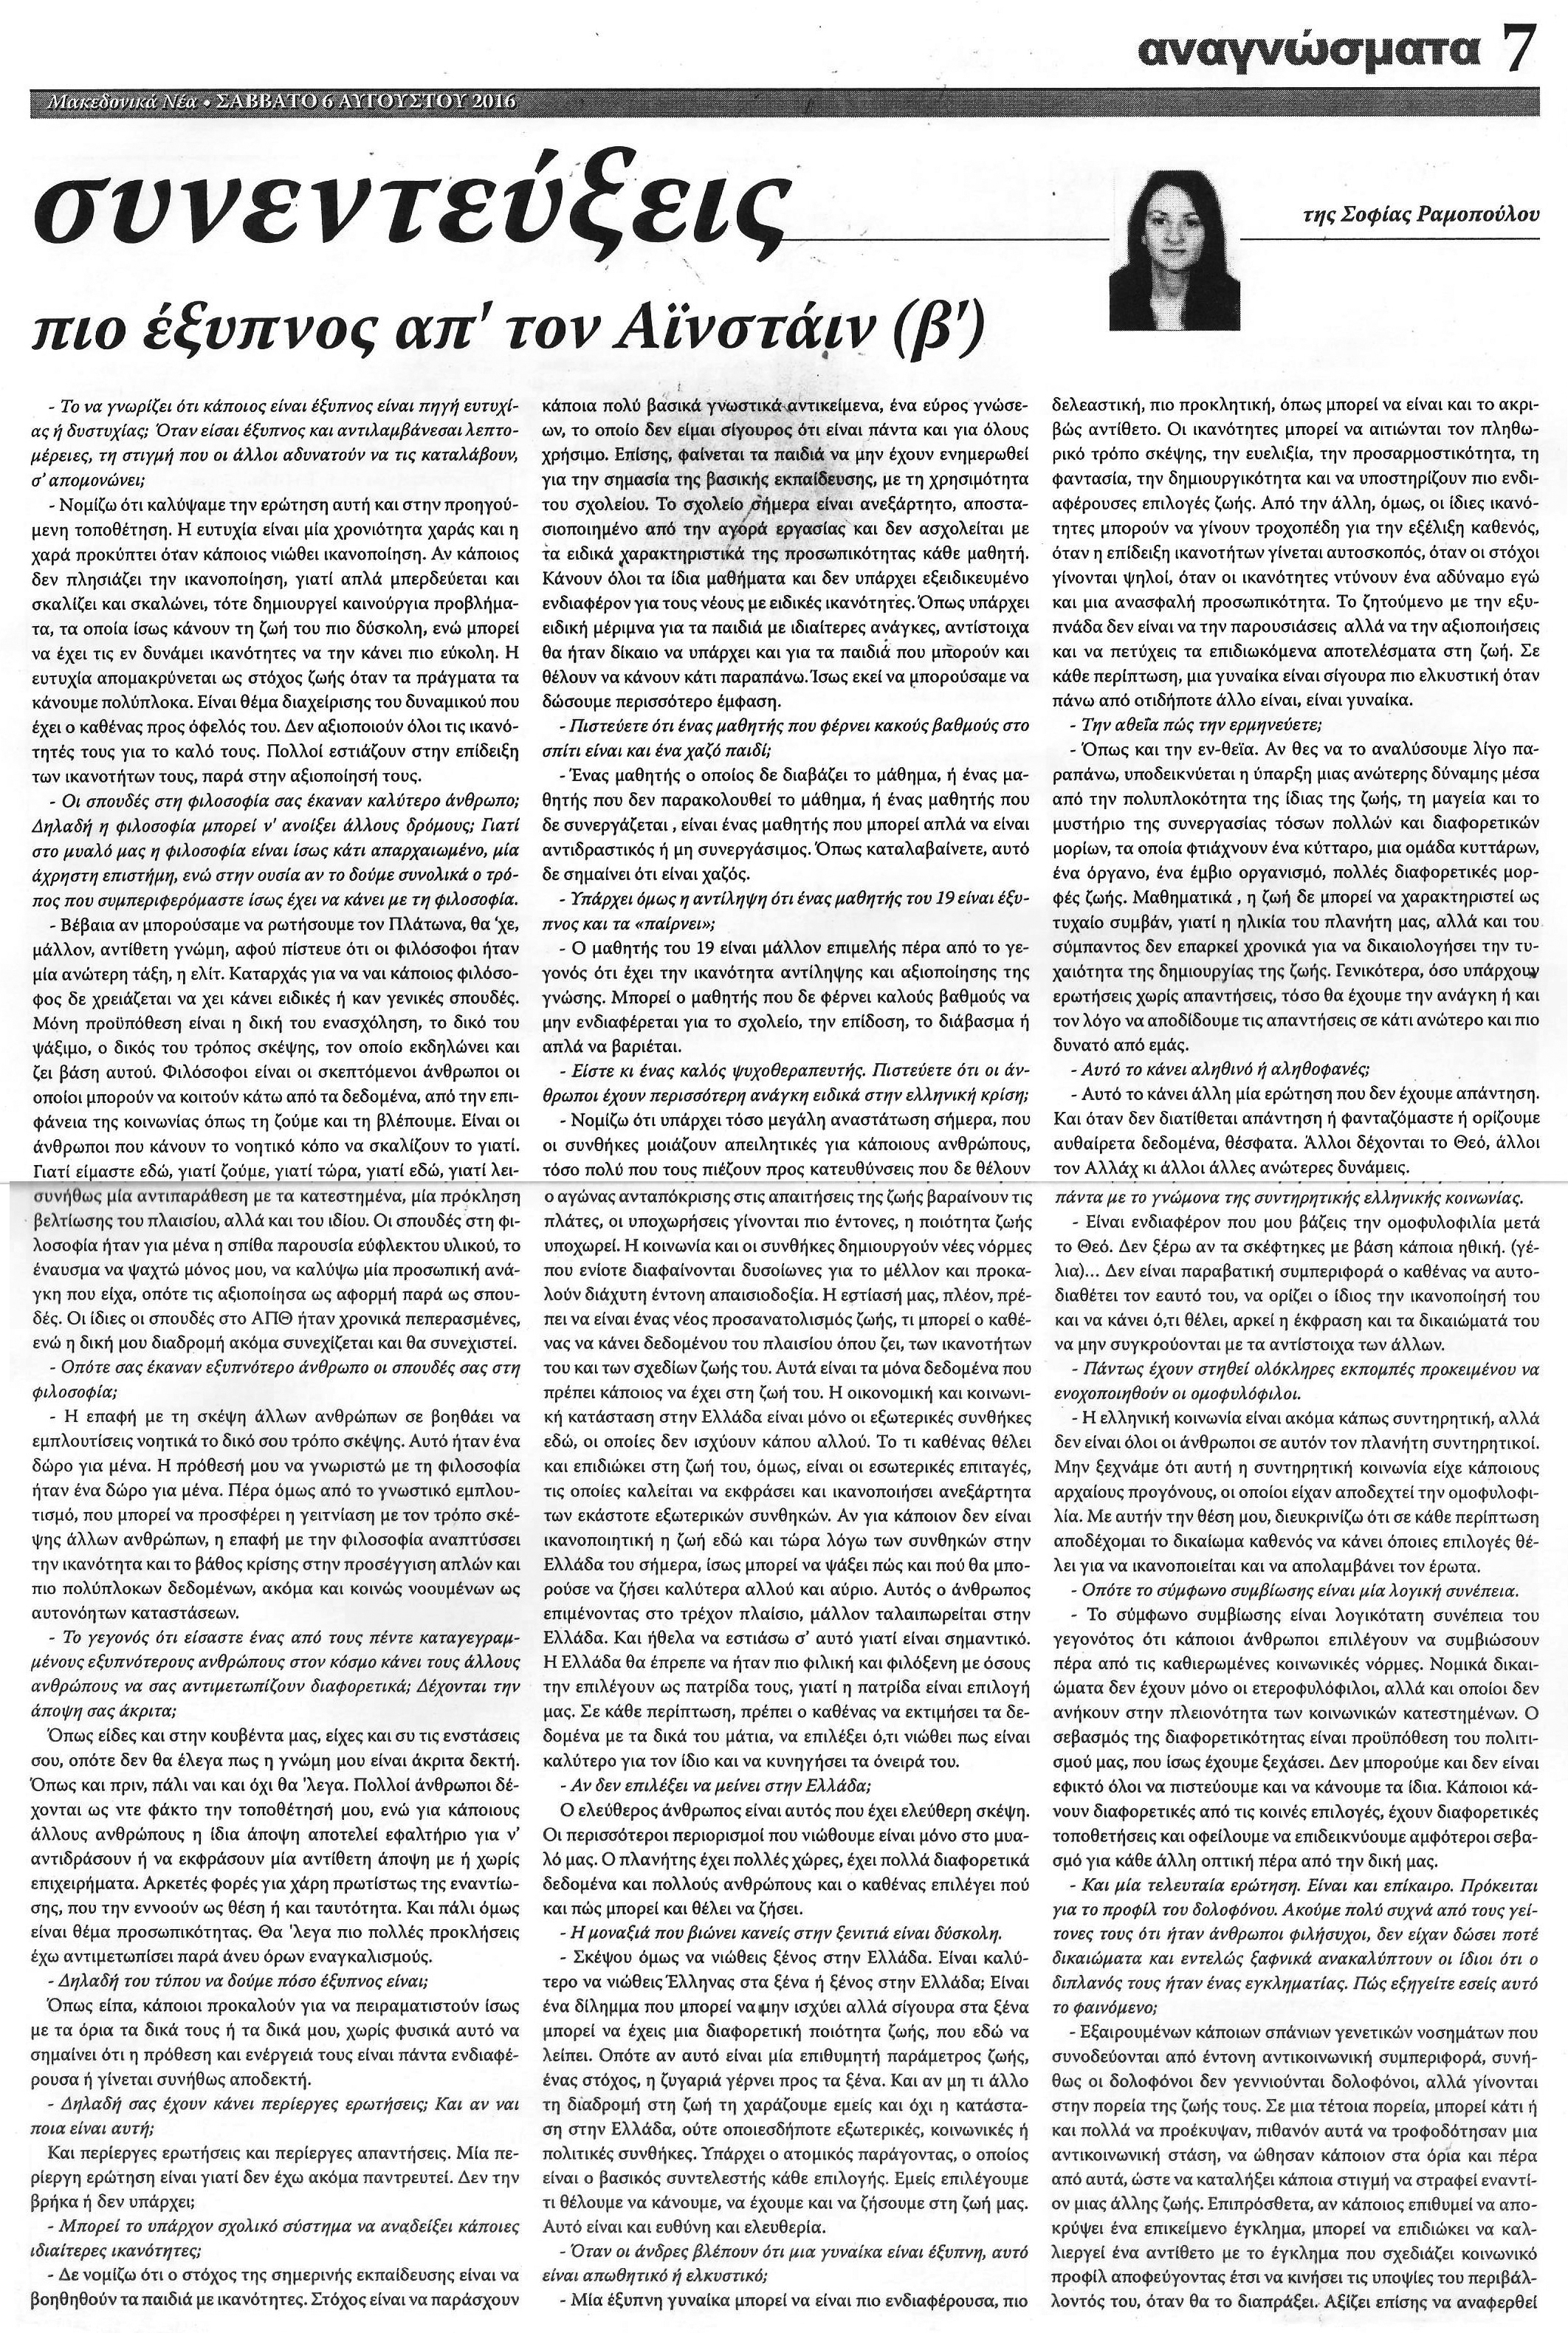 Dr Evangelos Katsioulis on Makedonika Nea